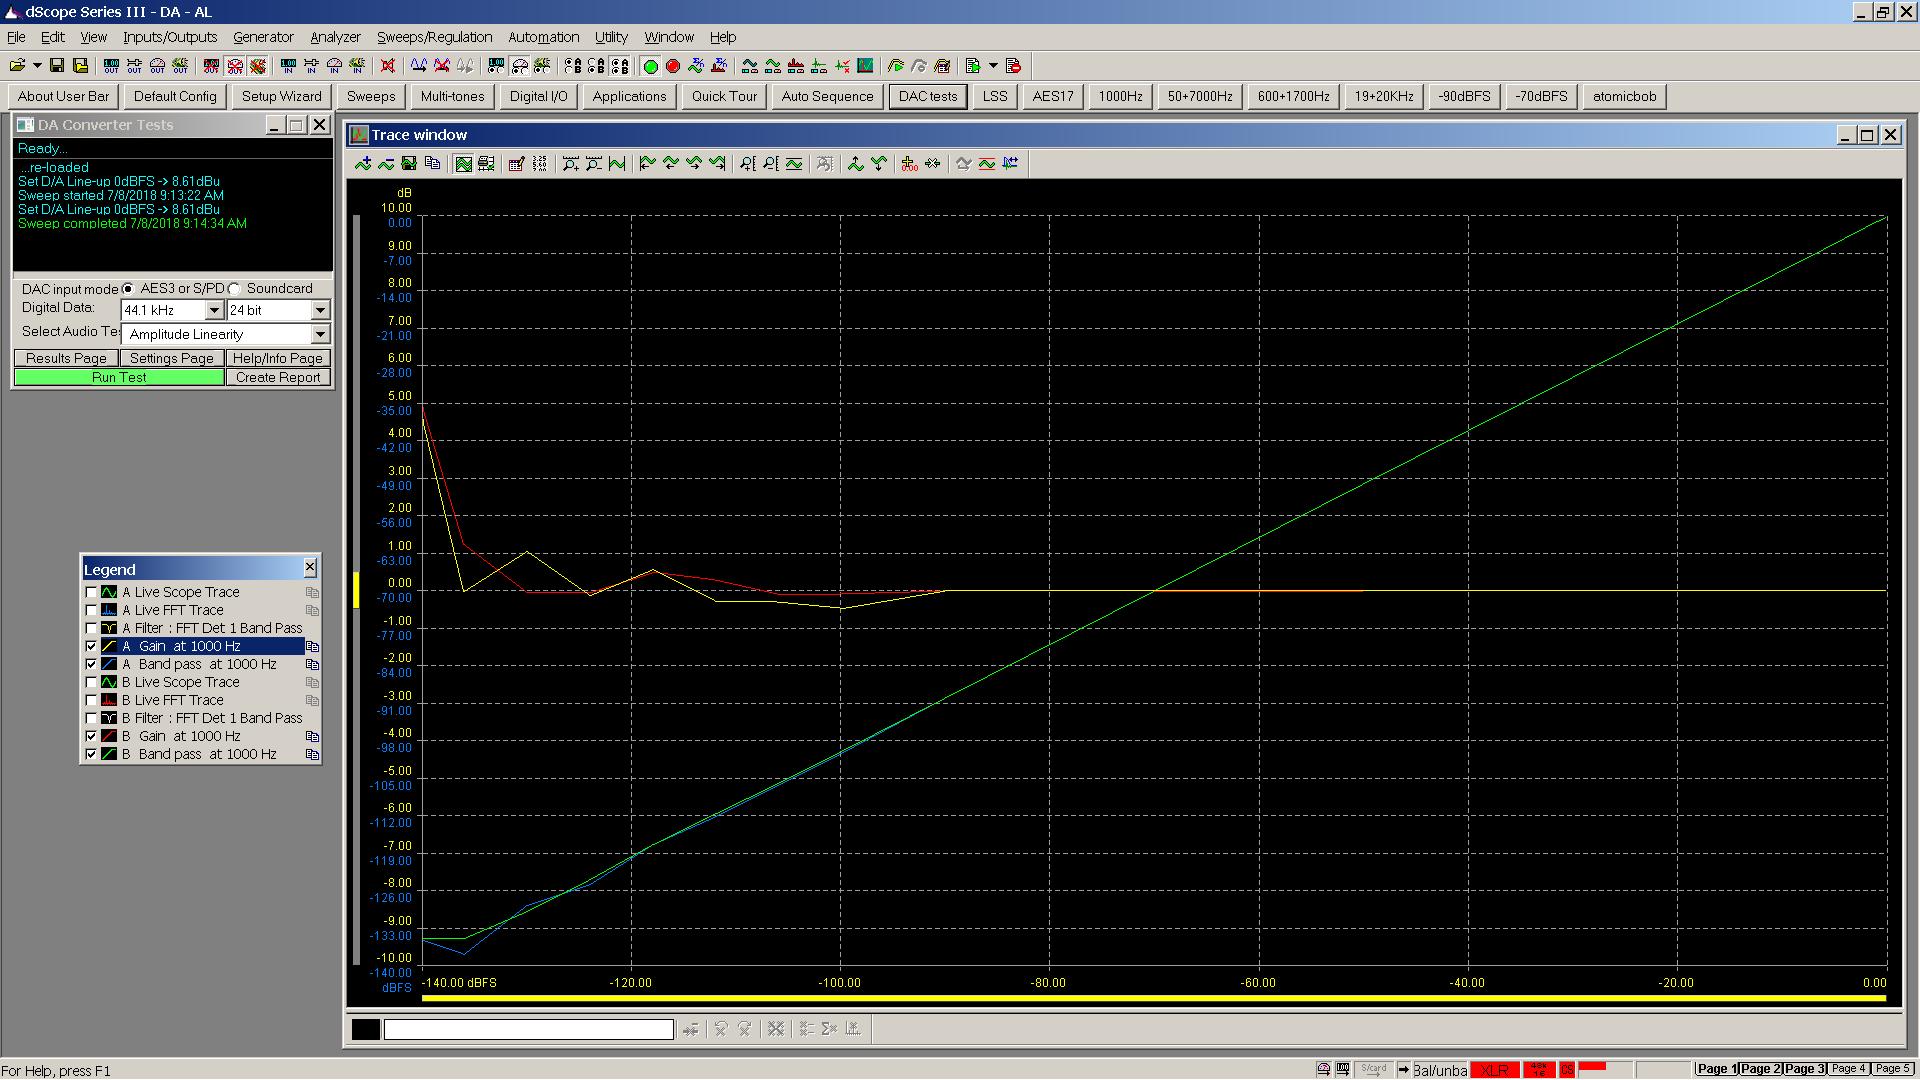 20180708-12 Modi MB SE 1 KHz gain linearity + bandpass - spdif.png